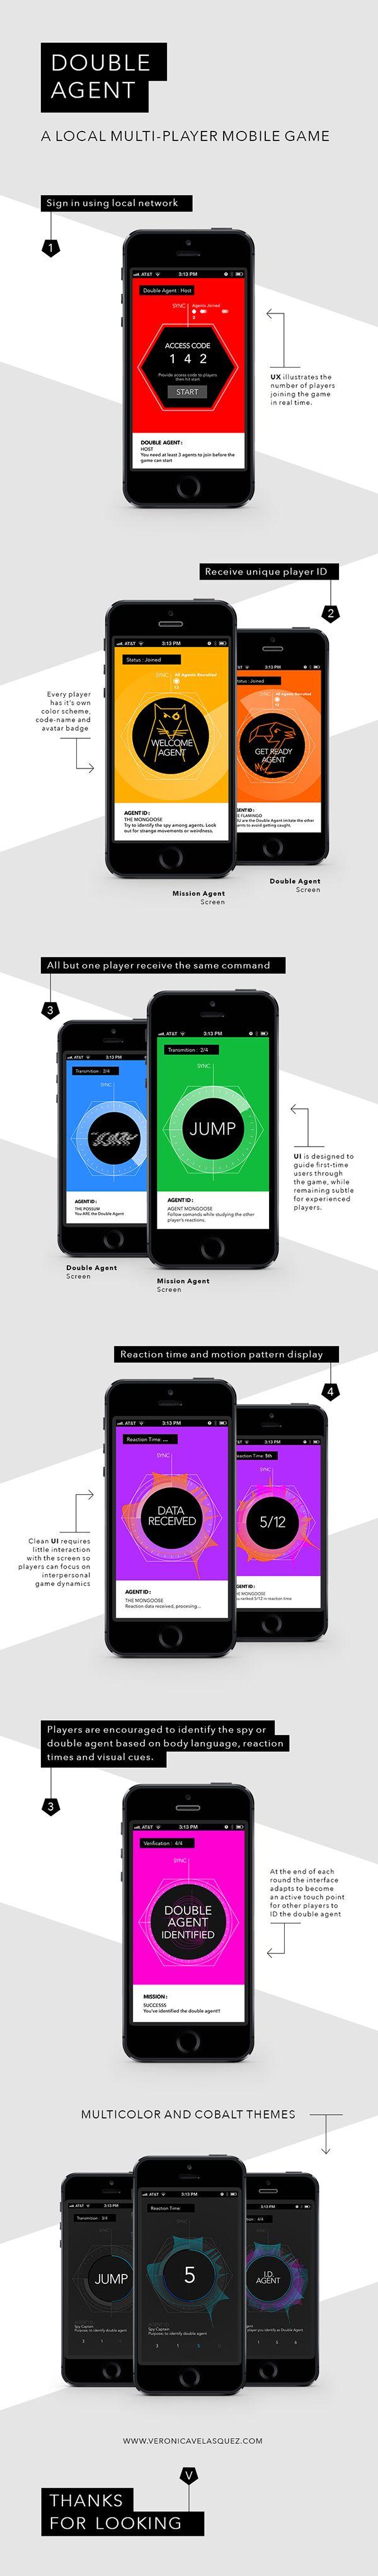 Double Agent IOS Game by Veronica Velasquez, via Behance